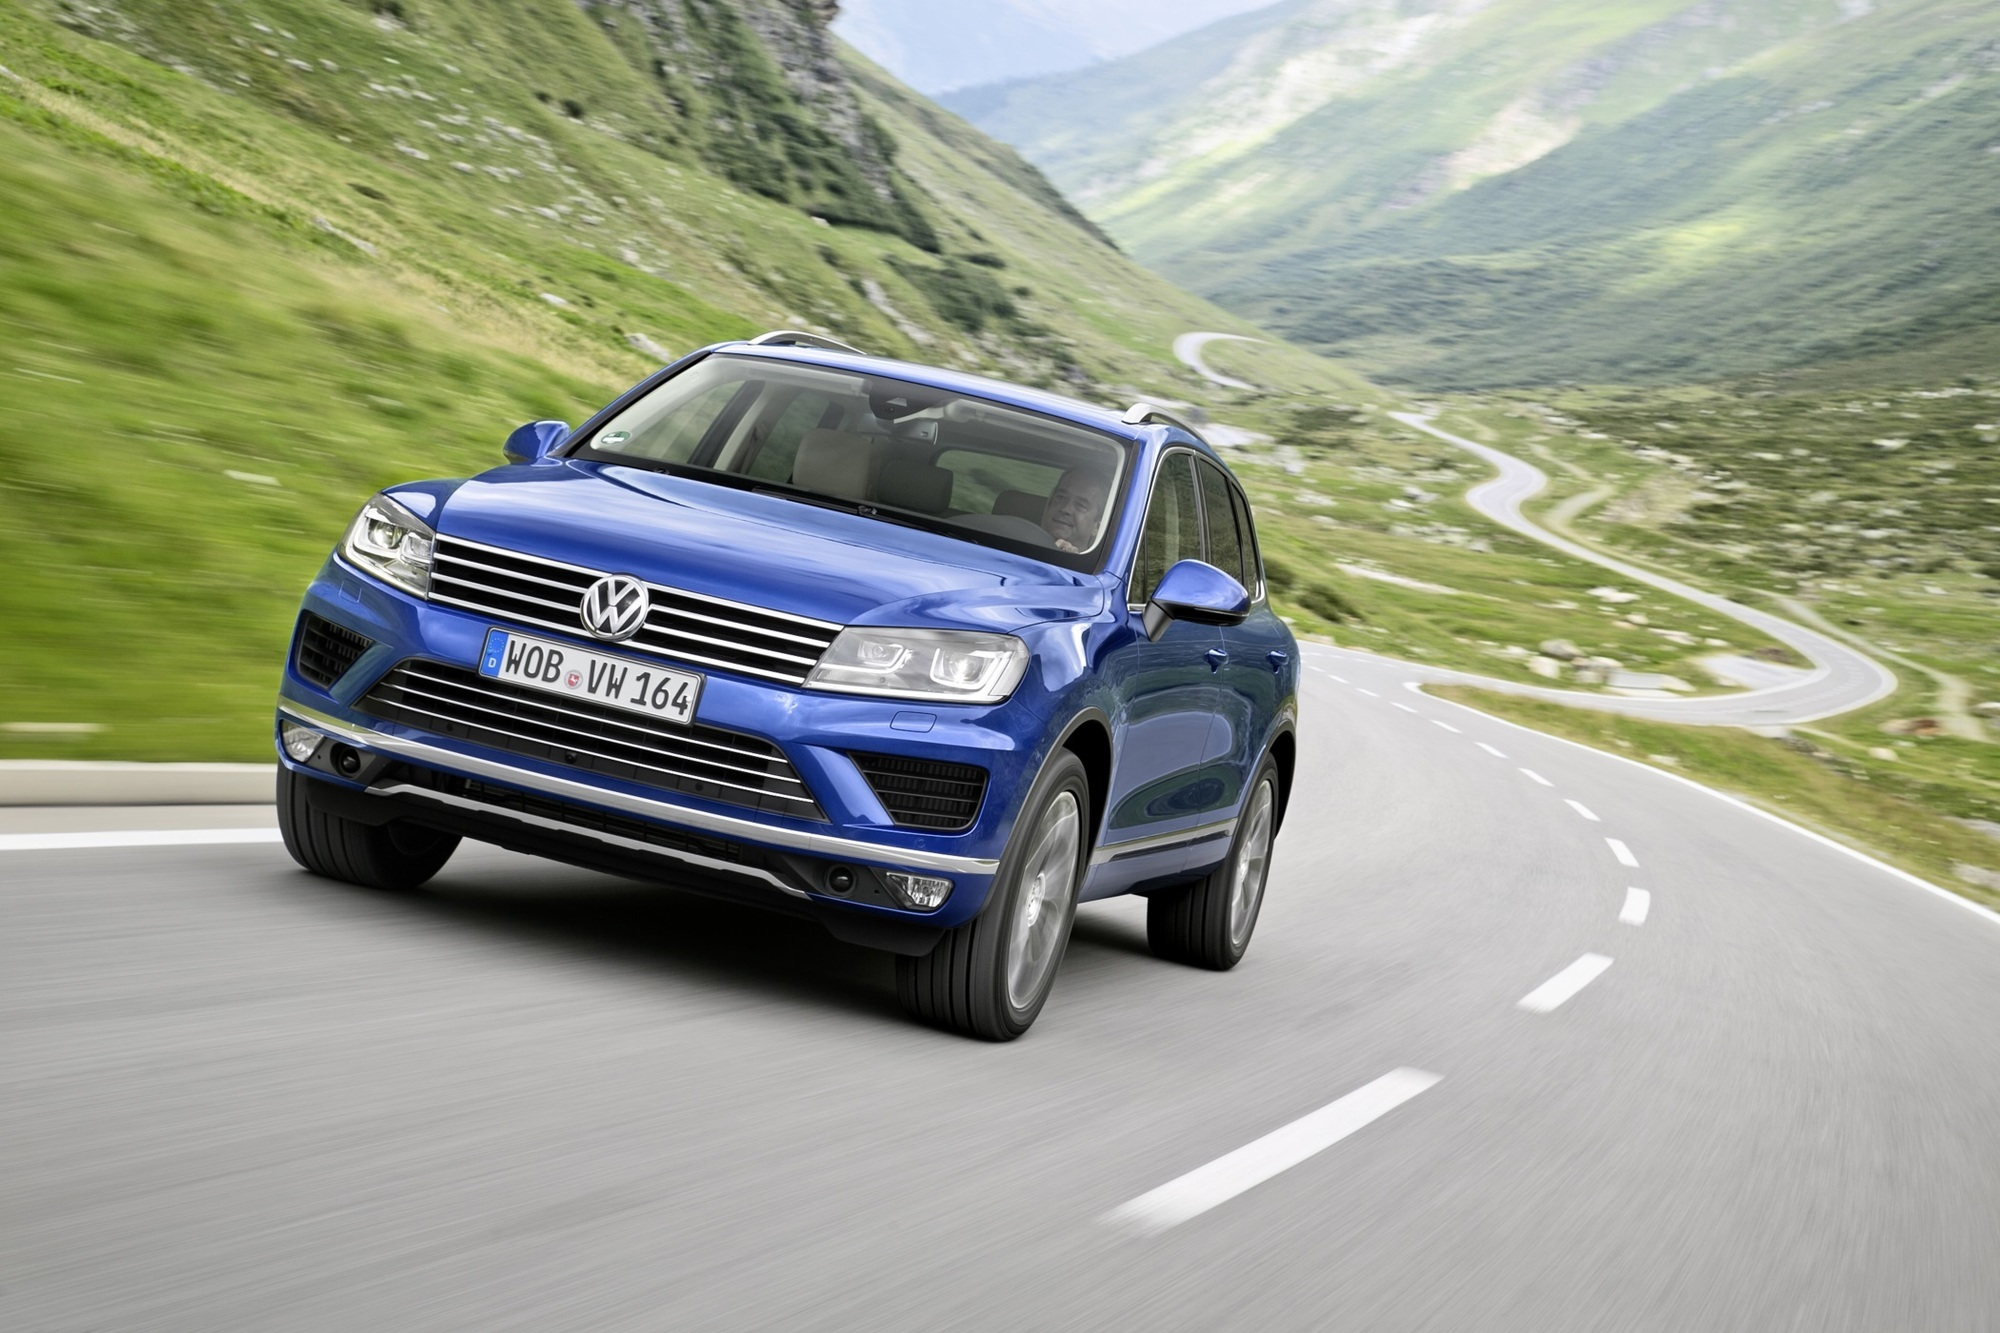 Test: VW Touareg V6 TDI - Dezent für alles